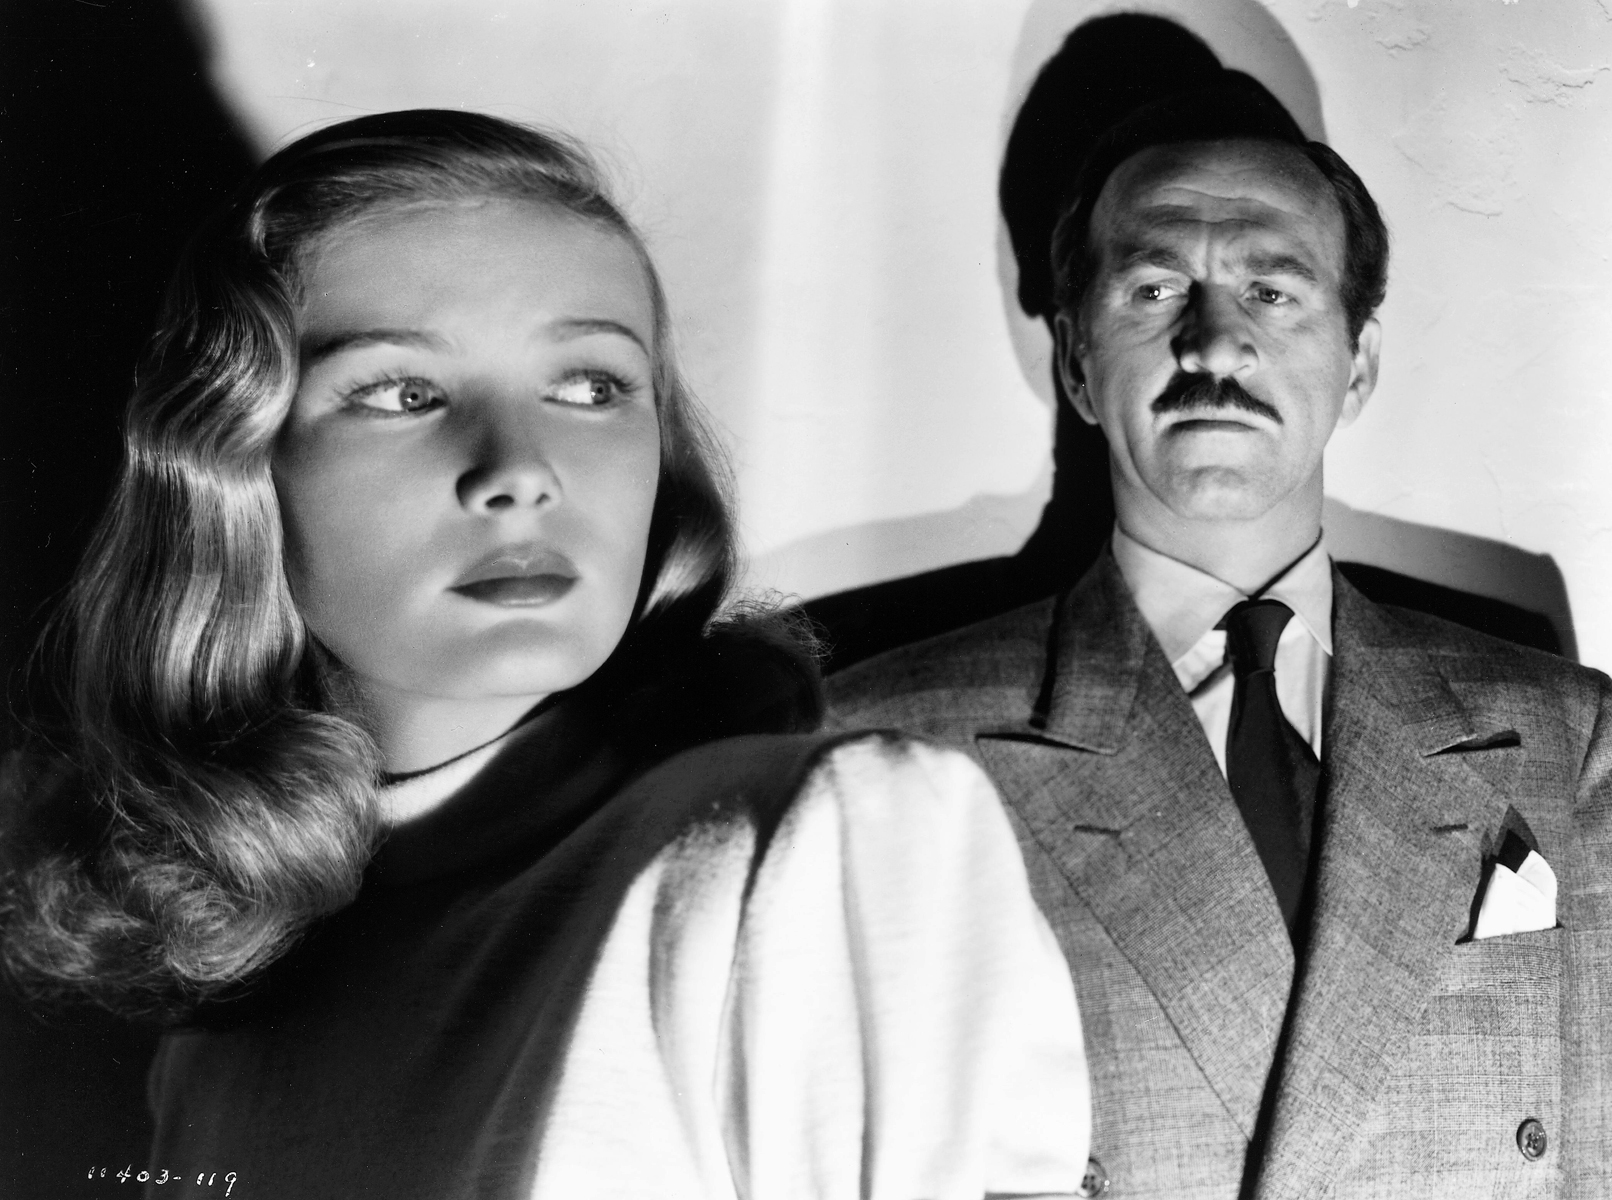 Veronica Lake and Howard Da Silva in The Blue Dahlia (1946)